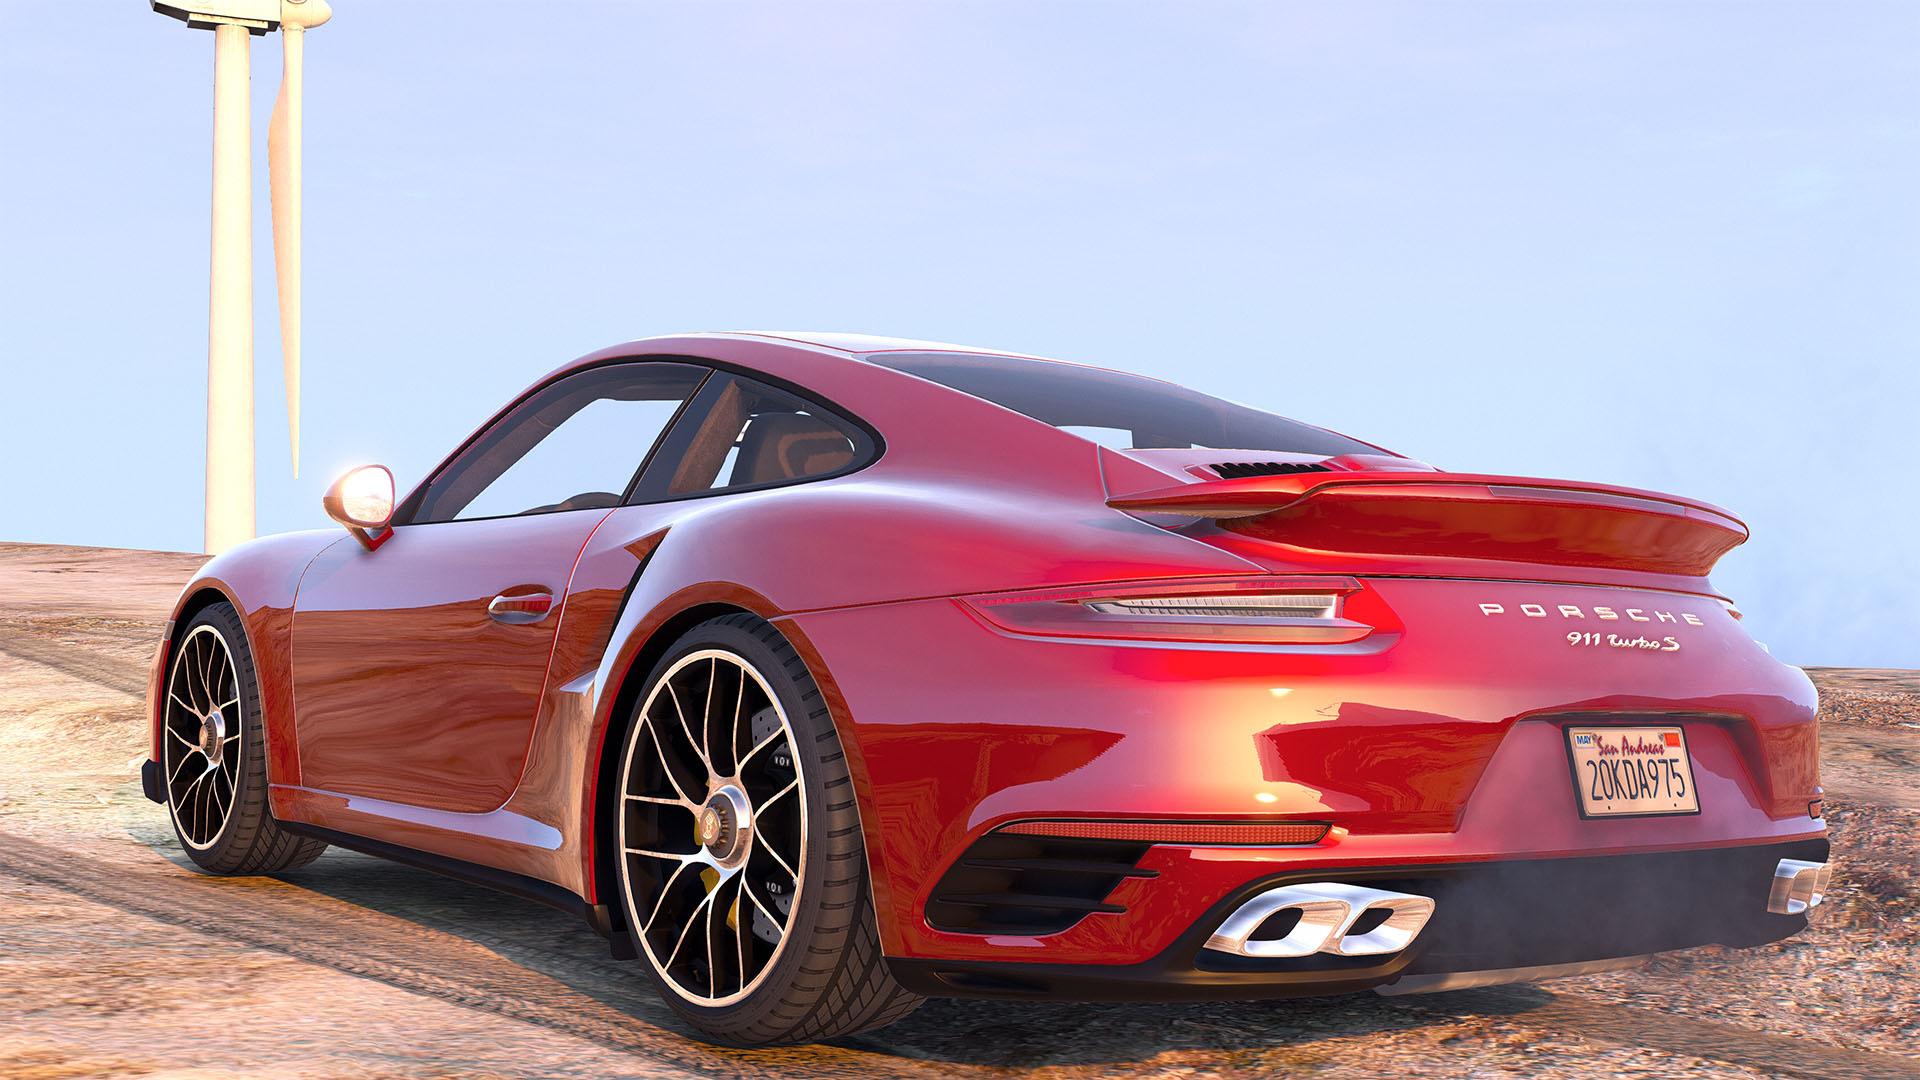 2016 porsche 911 turbo s add on replace auto spoiler animated template gta5. Black Bedroom Furniture Sets. Home Design Ideas